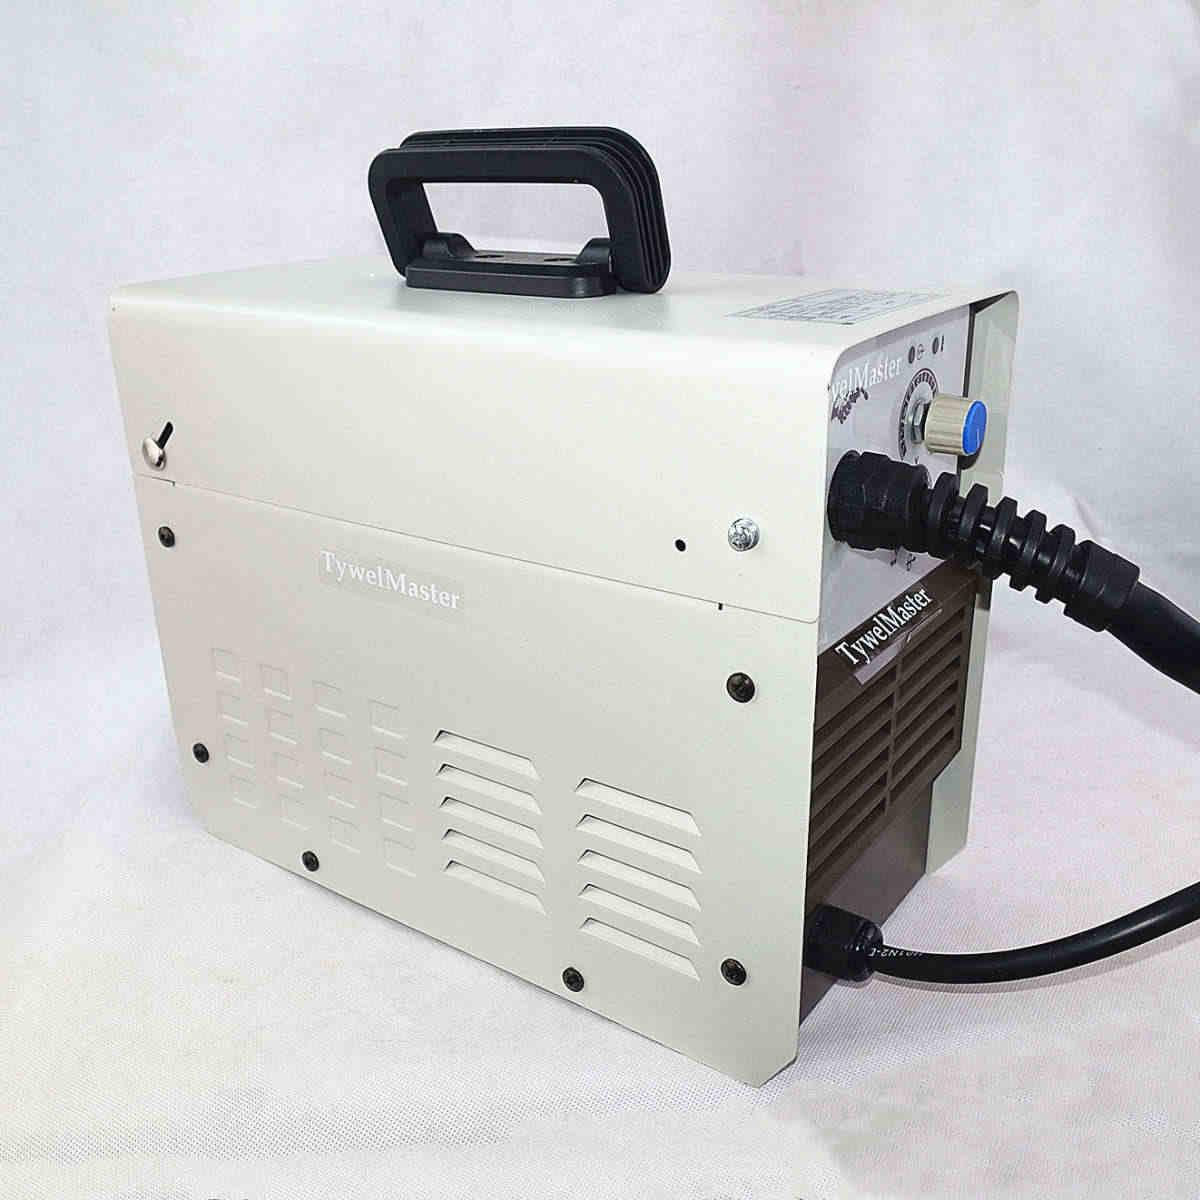 Gasless MIGเชื่อมเครื่อง 120A 230Vอินเวอร์เตอร์IGBT 1 กิโลกรัมSPOOL Self SHIELD E71T-GS Cored Arcลวดไม่มีแก๊สMIGเครื่องเชื่อม